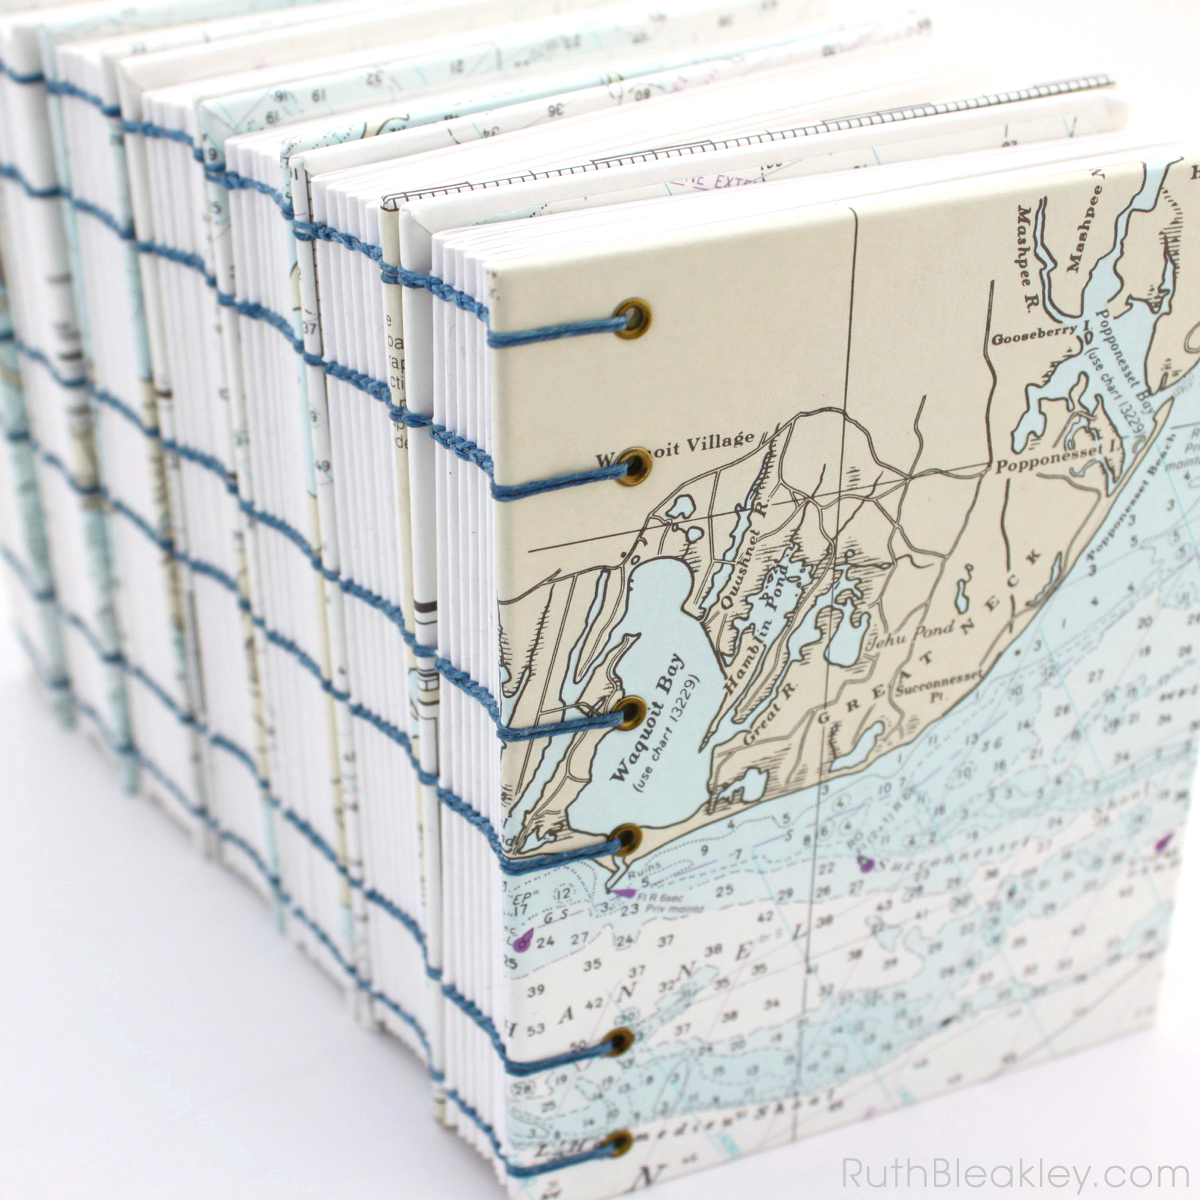 Cape Cod Nautical Chart Journals handmade by Ruth Bleakley - Coptic Stitch